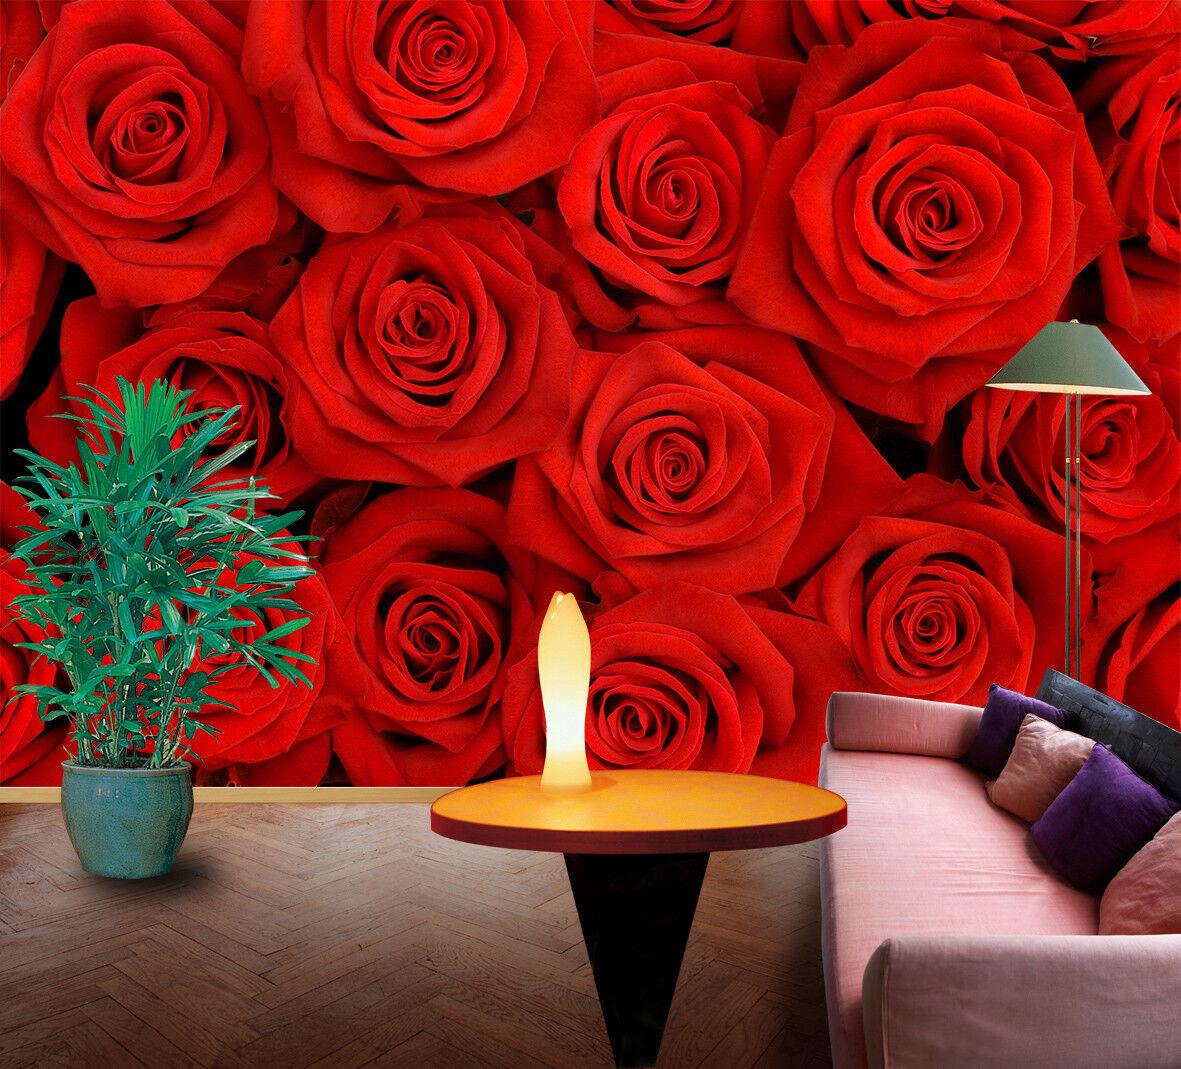 3D Rote Rosa Blaumenstrauß 9053 Tapete Wandgemälde Tapeten Bild Familie DE Jenny   Genialität    Attraktive Mode    Neues Produkt